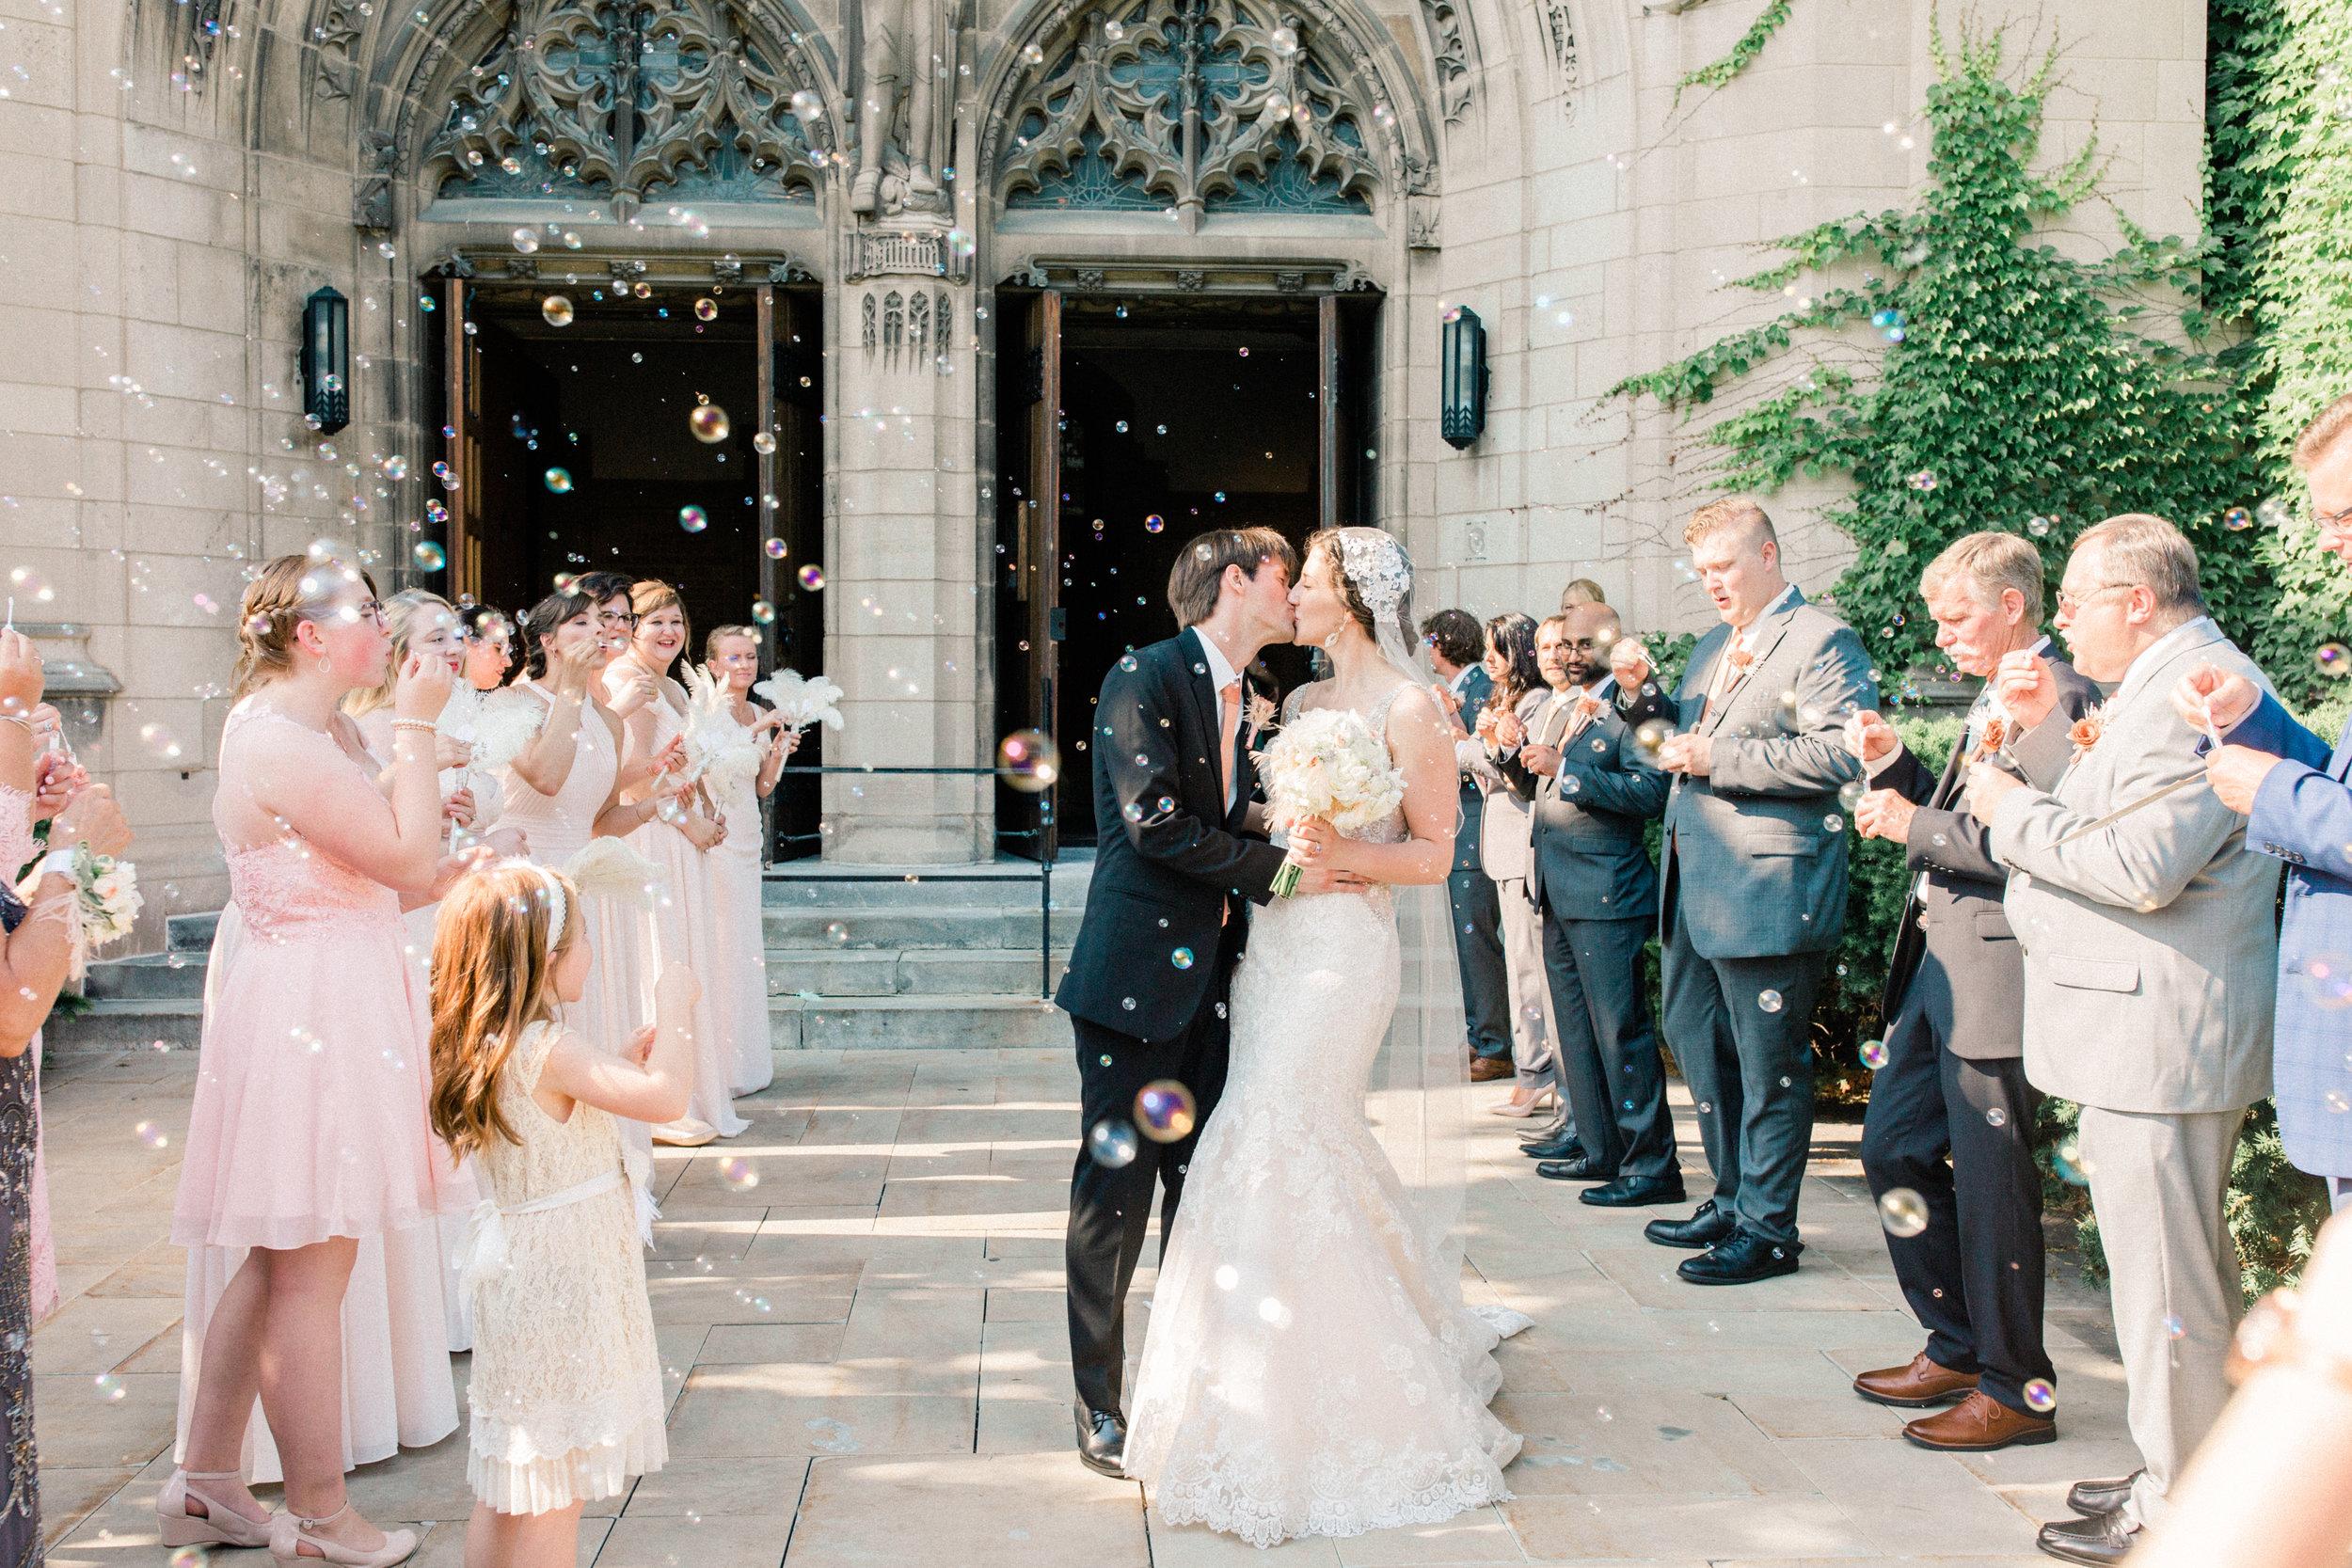 Dorothy_Louise_Photography_University_of_Chicago_Chapel_Wedding-40.jpg